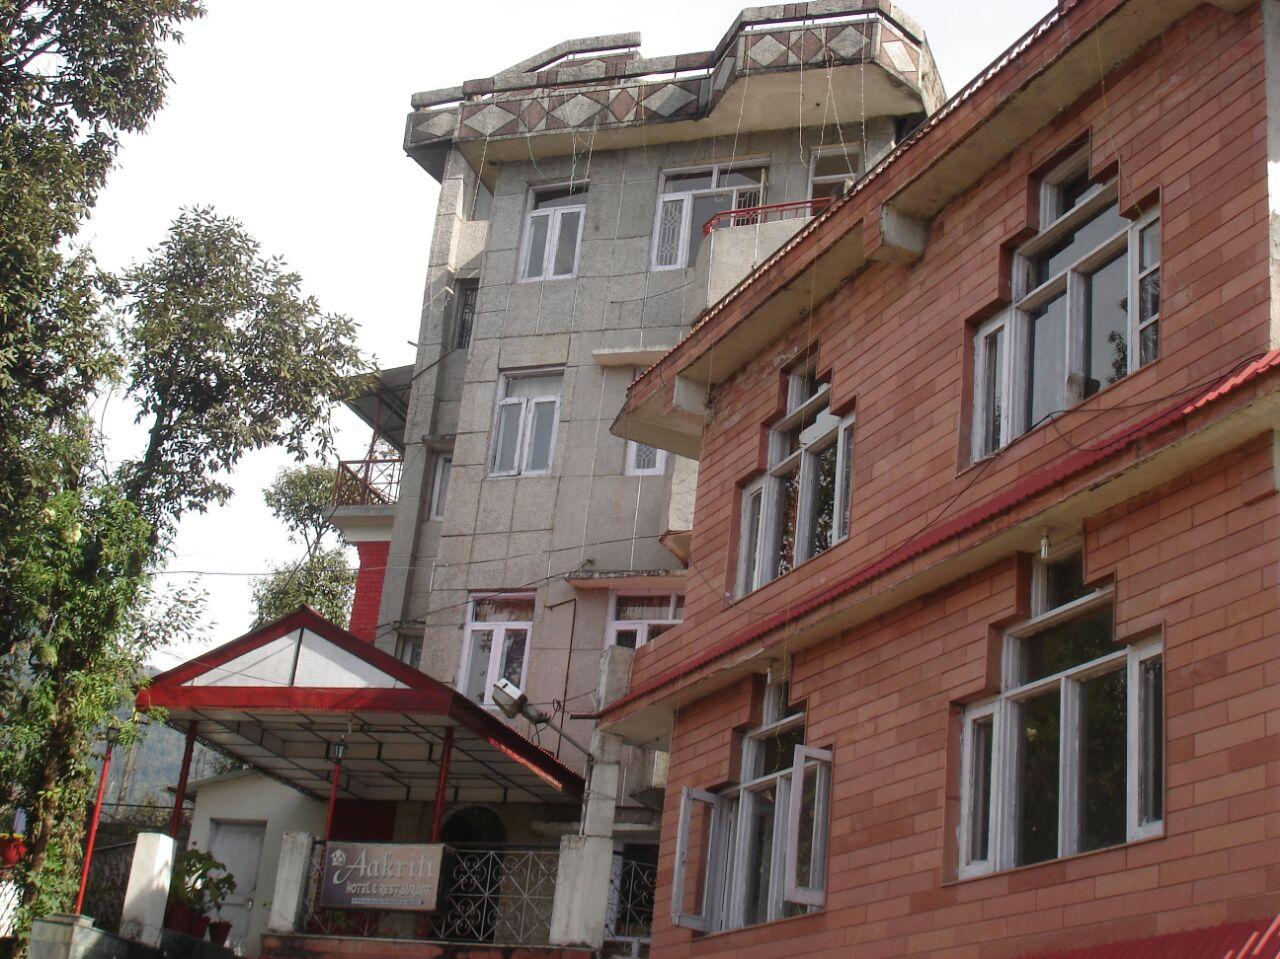 Aakriti Hotel in Dharamshala